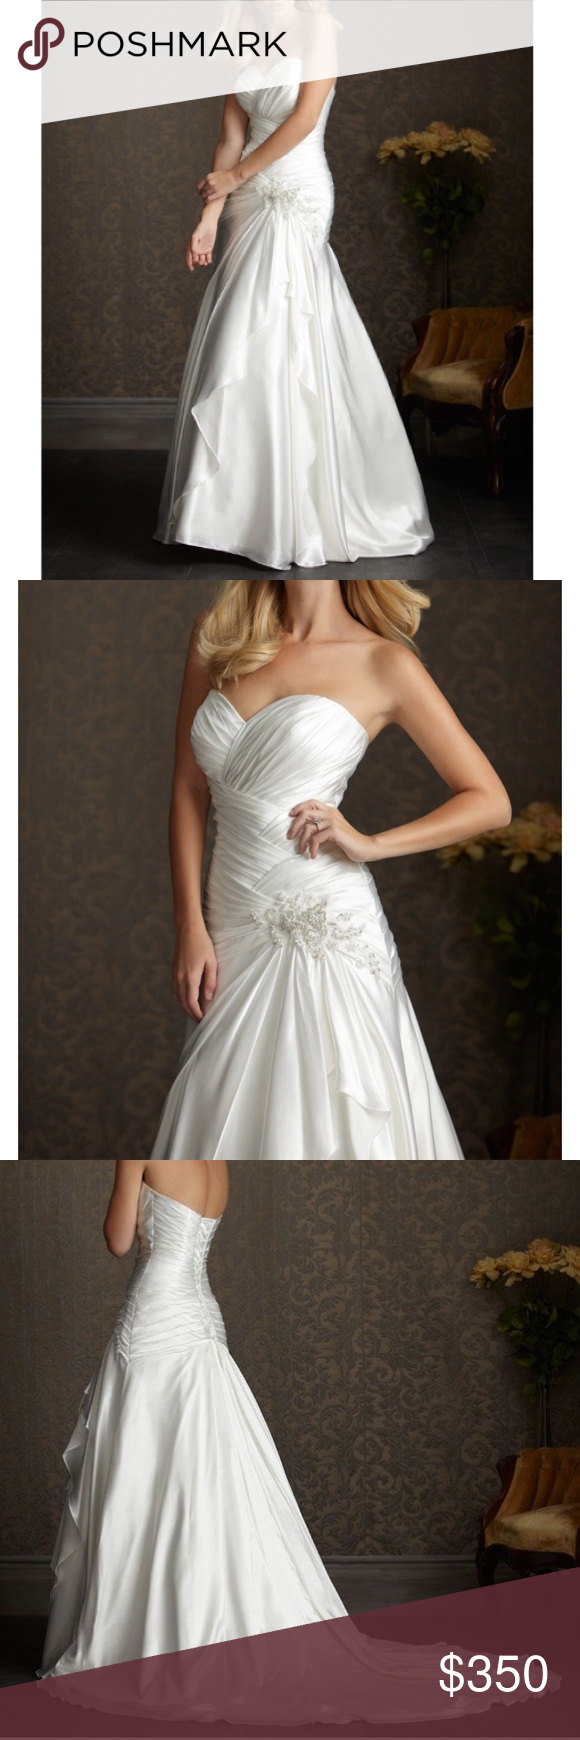 Allure bridal wedding dress drop waist style in my posh